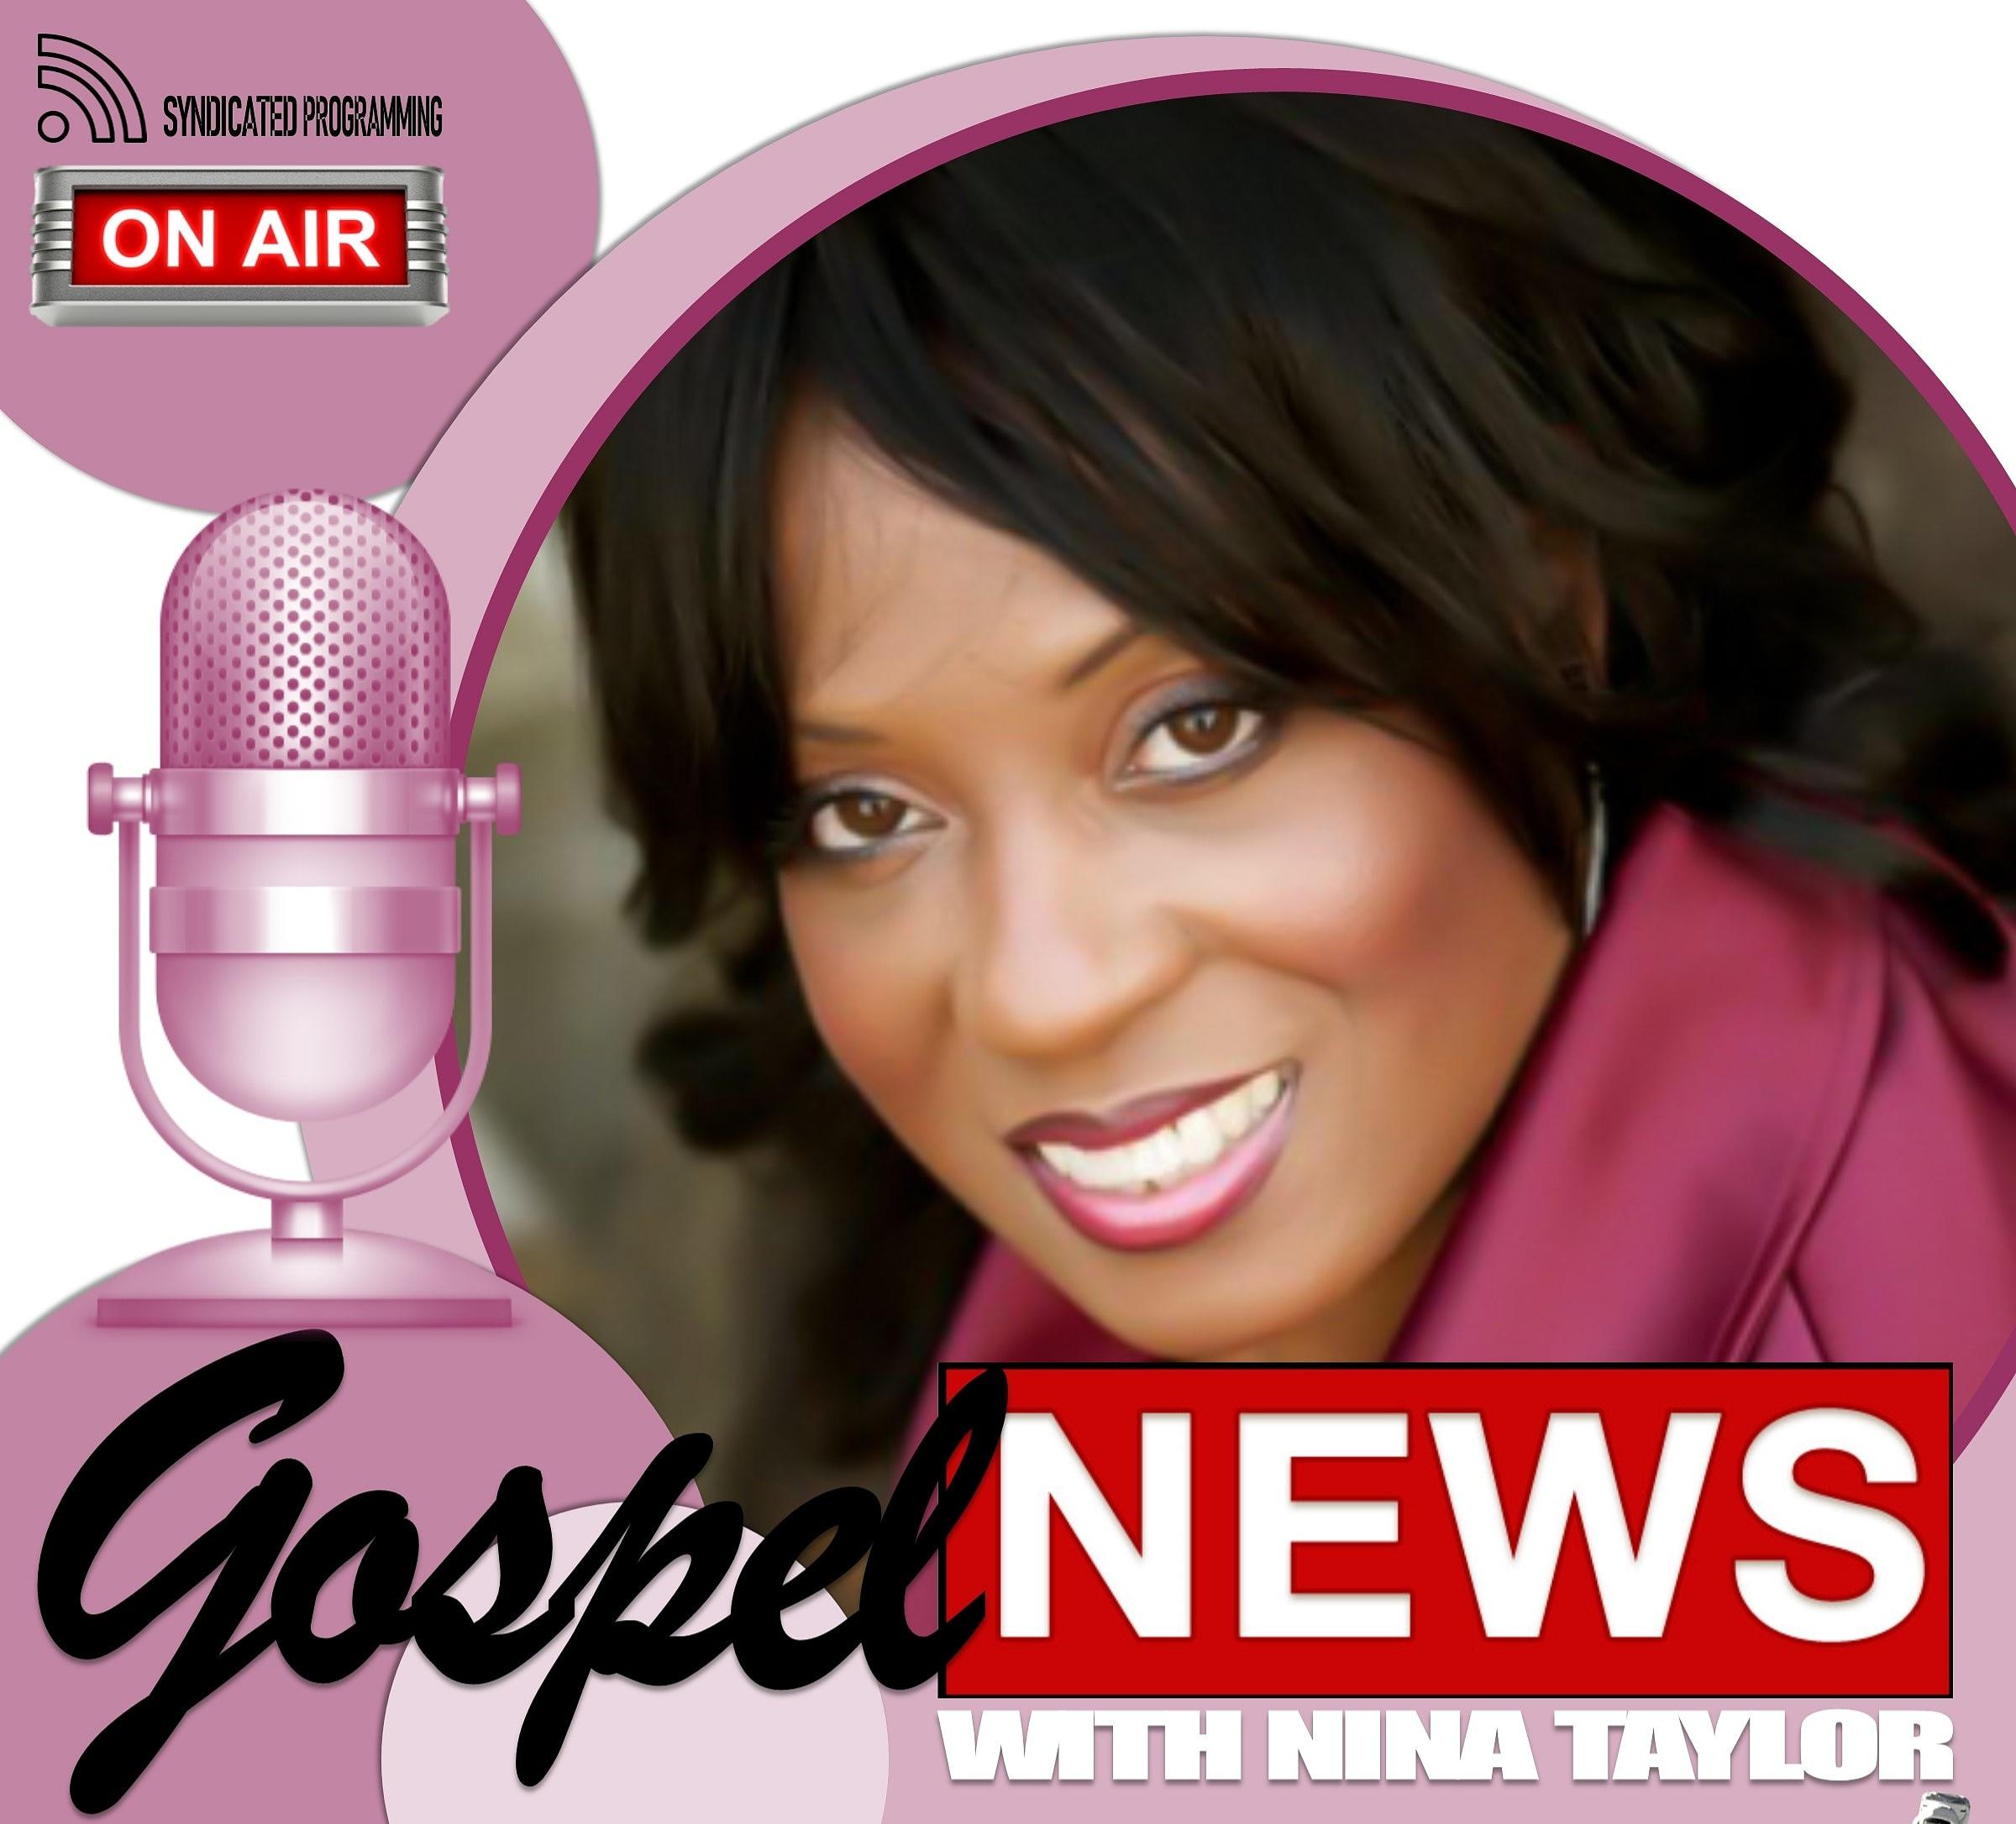 Gospel News Show Mondays at Noon